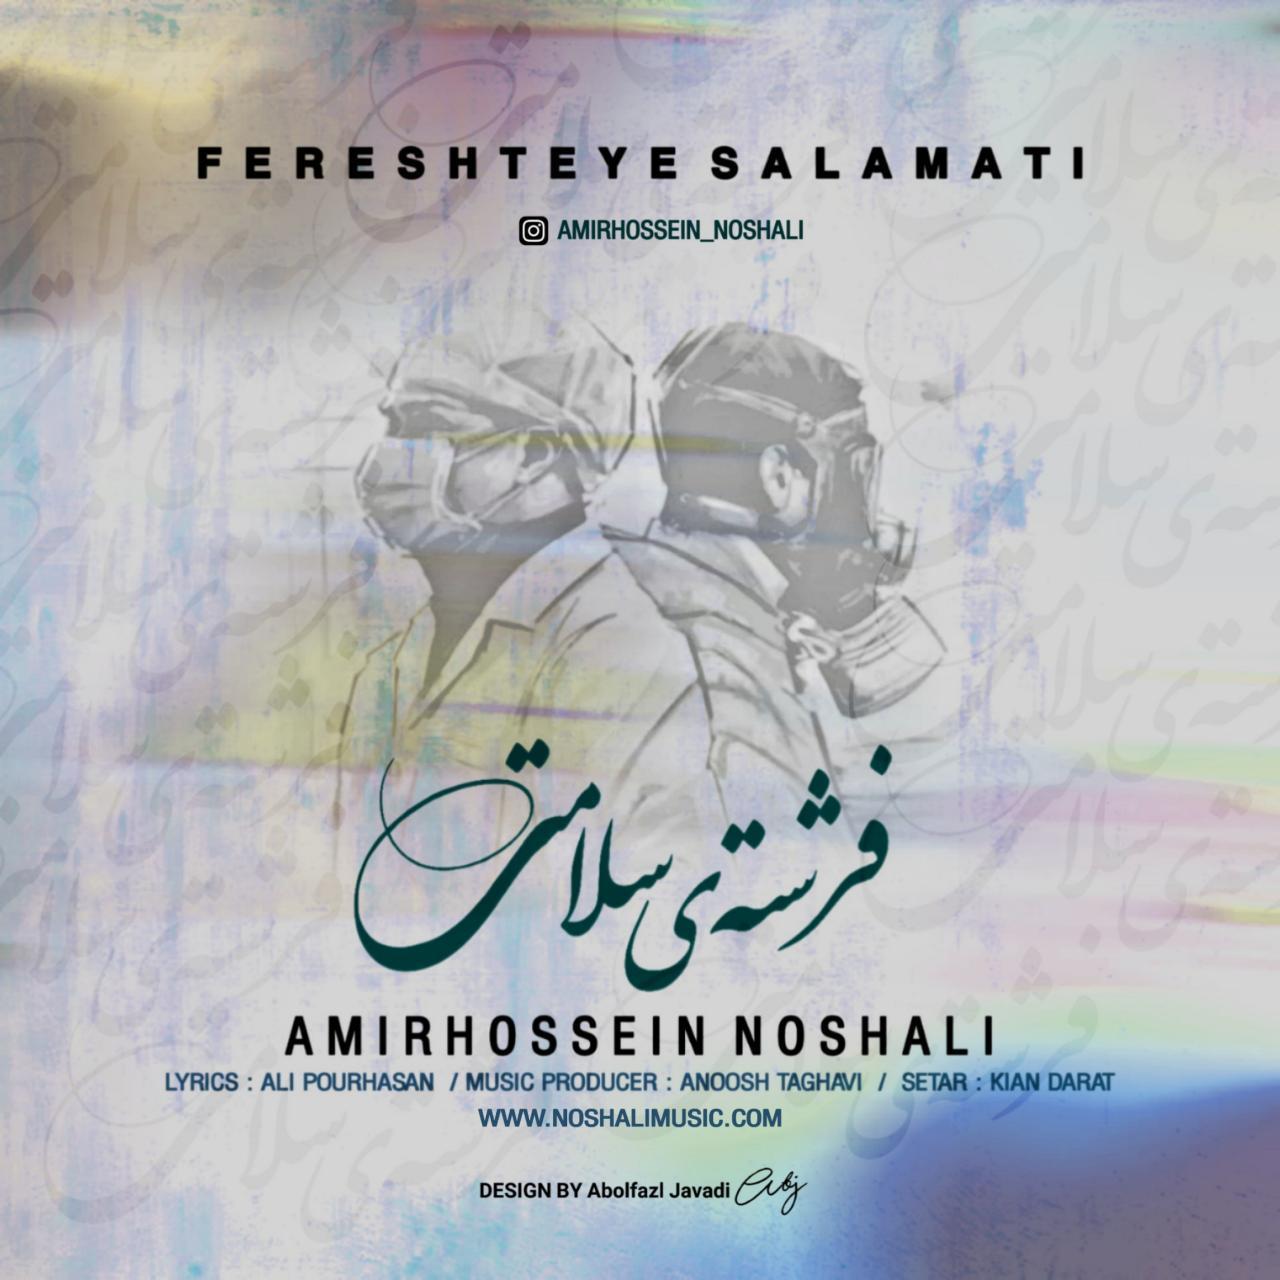 Amirhossein Noshali – Fereshteye Salamati